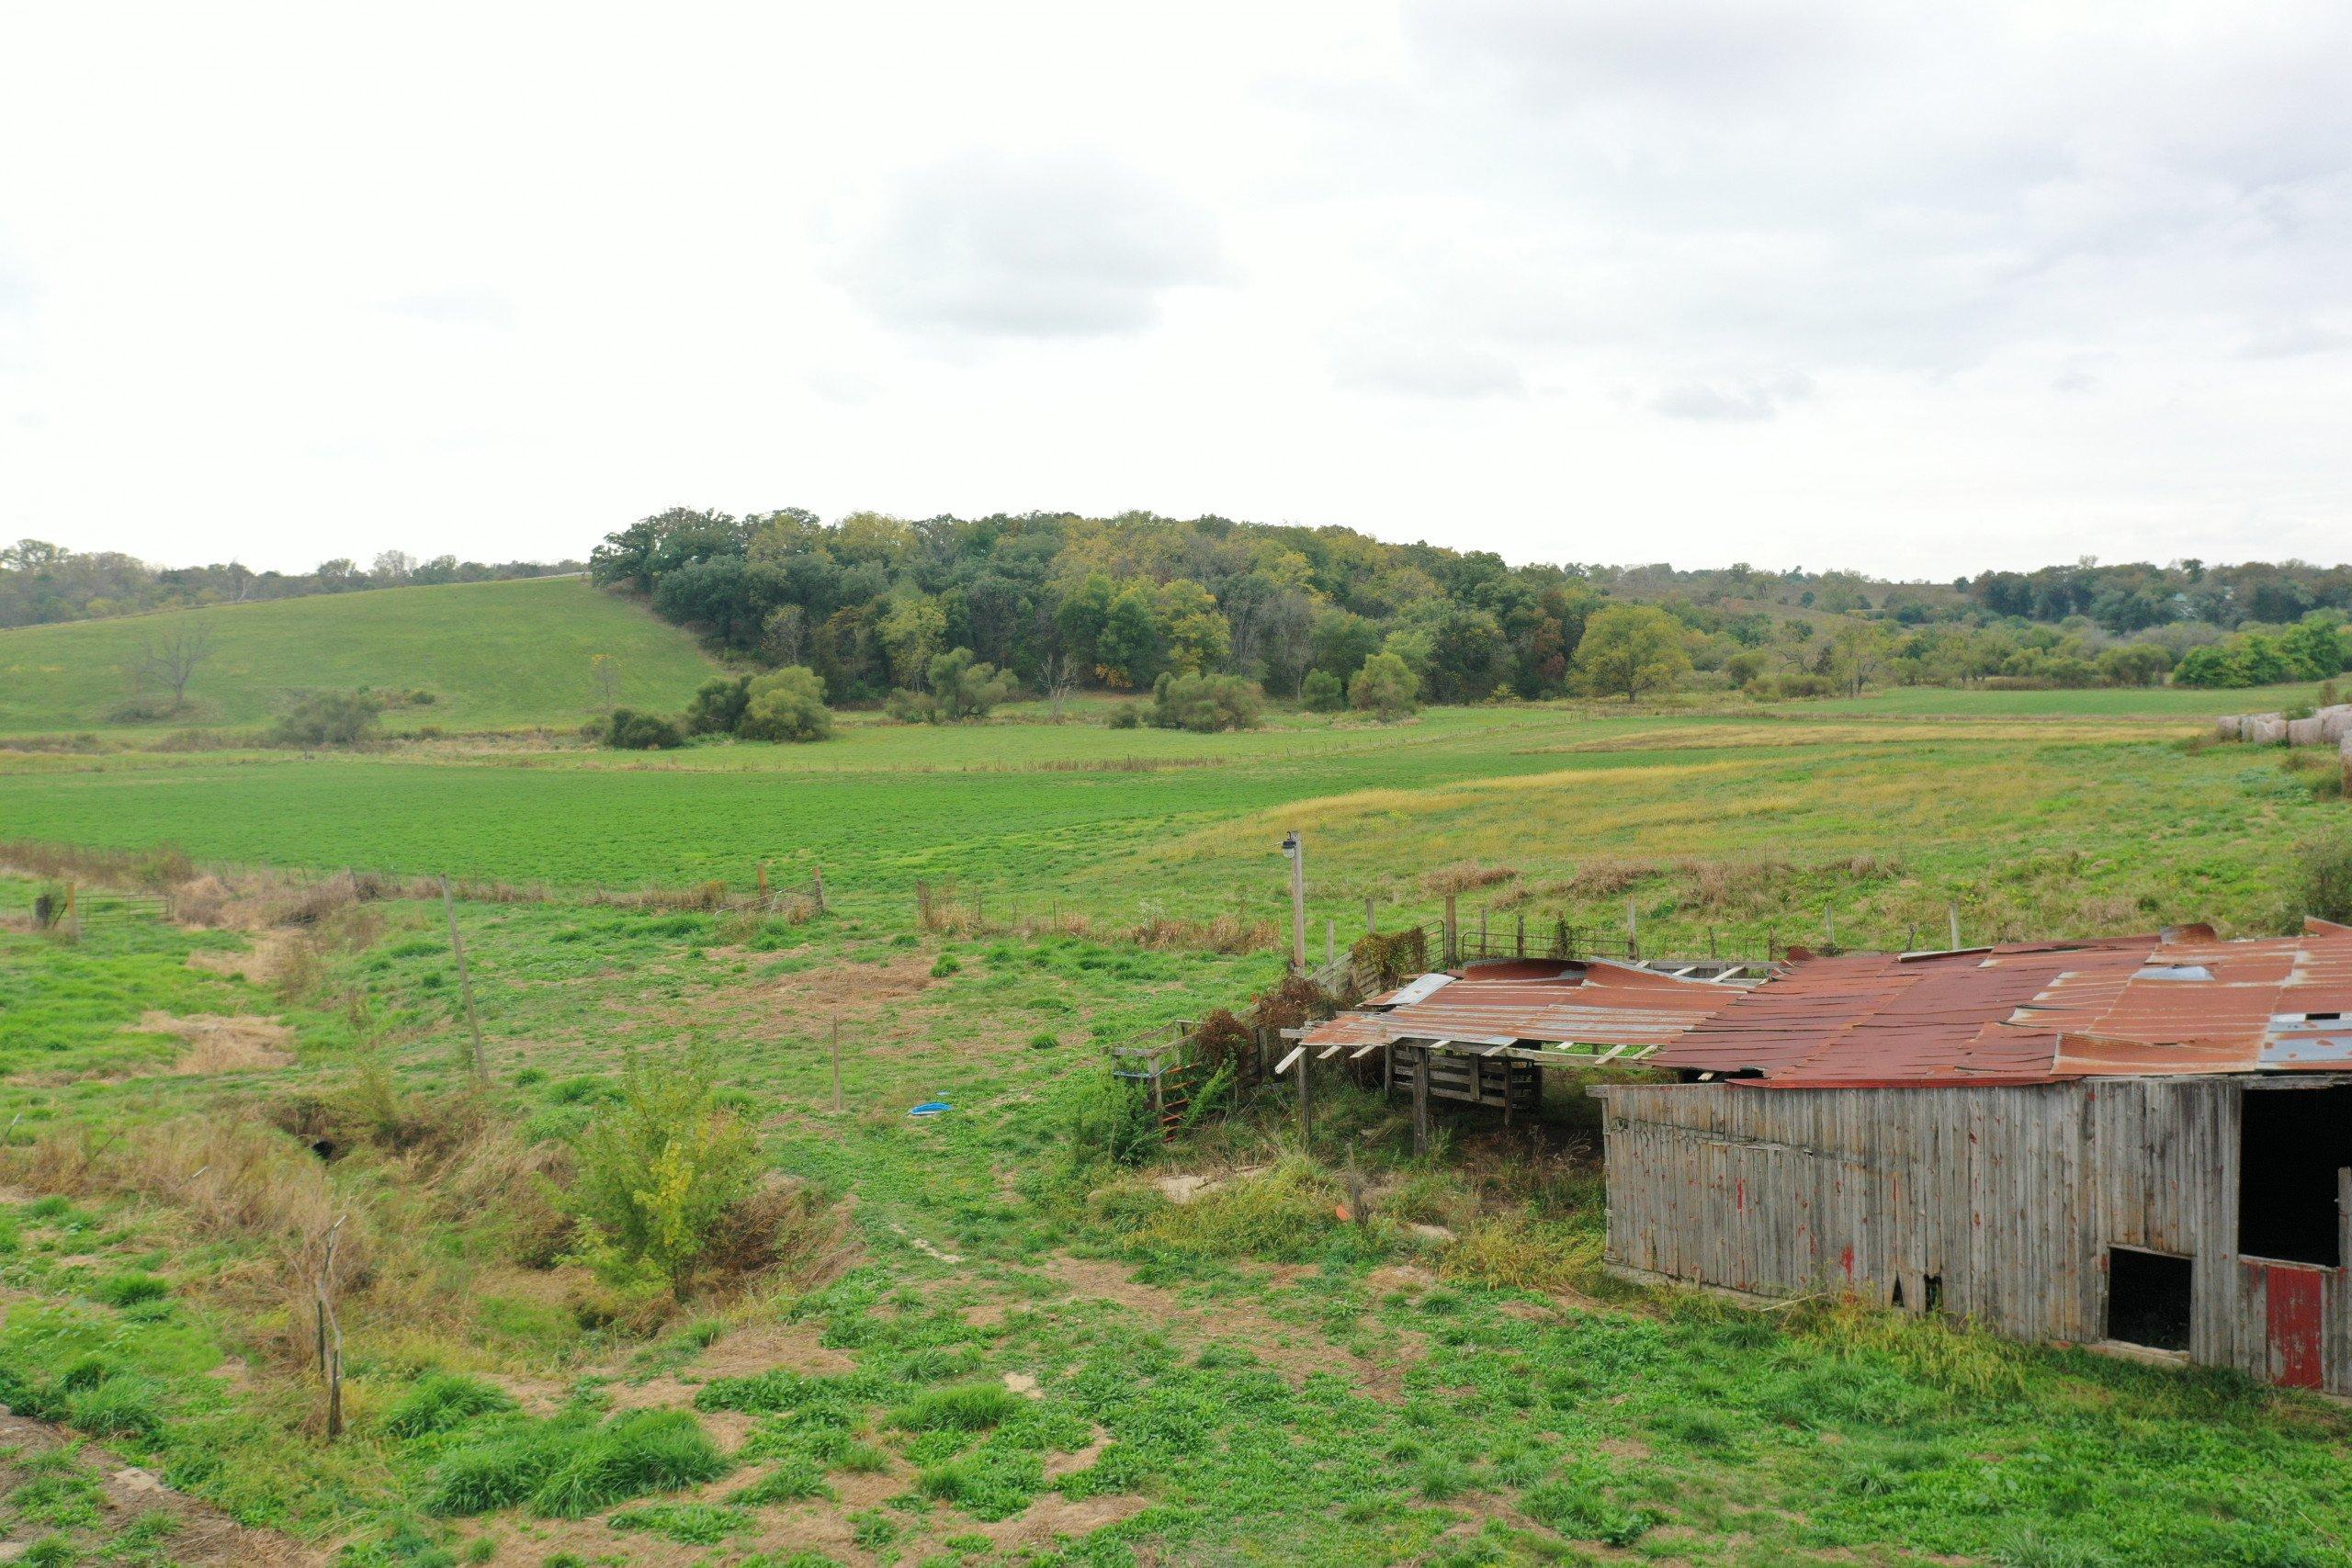 land-warren-county-iowa-200-acres-listing-number-15810-DJI_0570-0.jpg